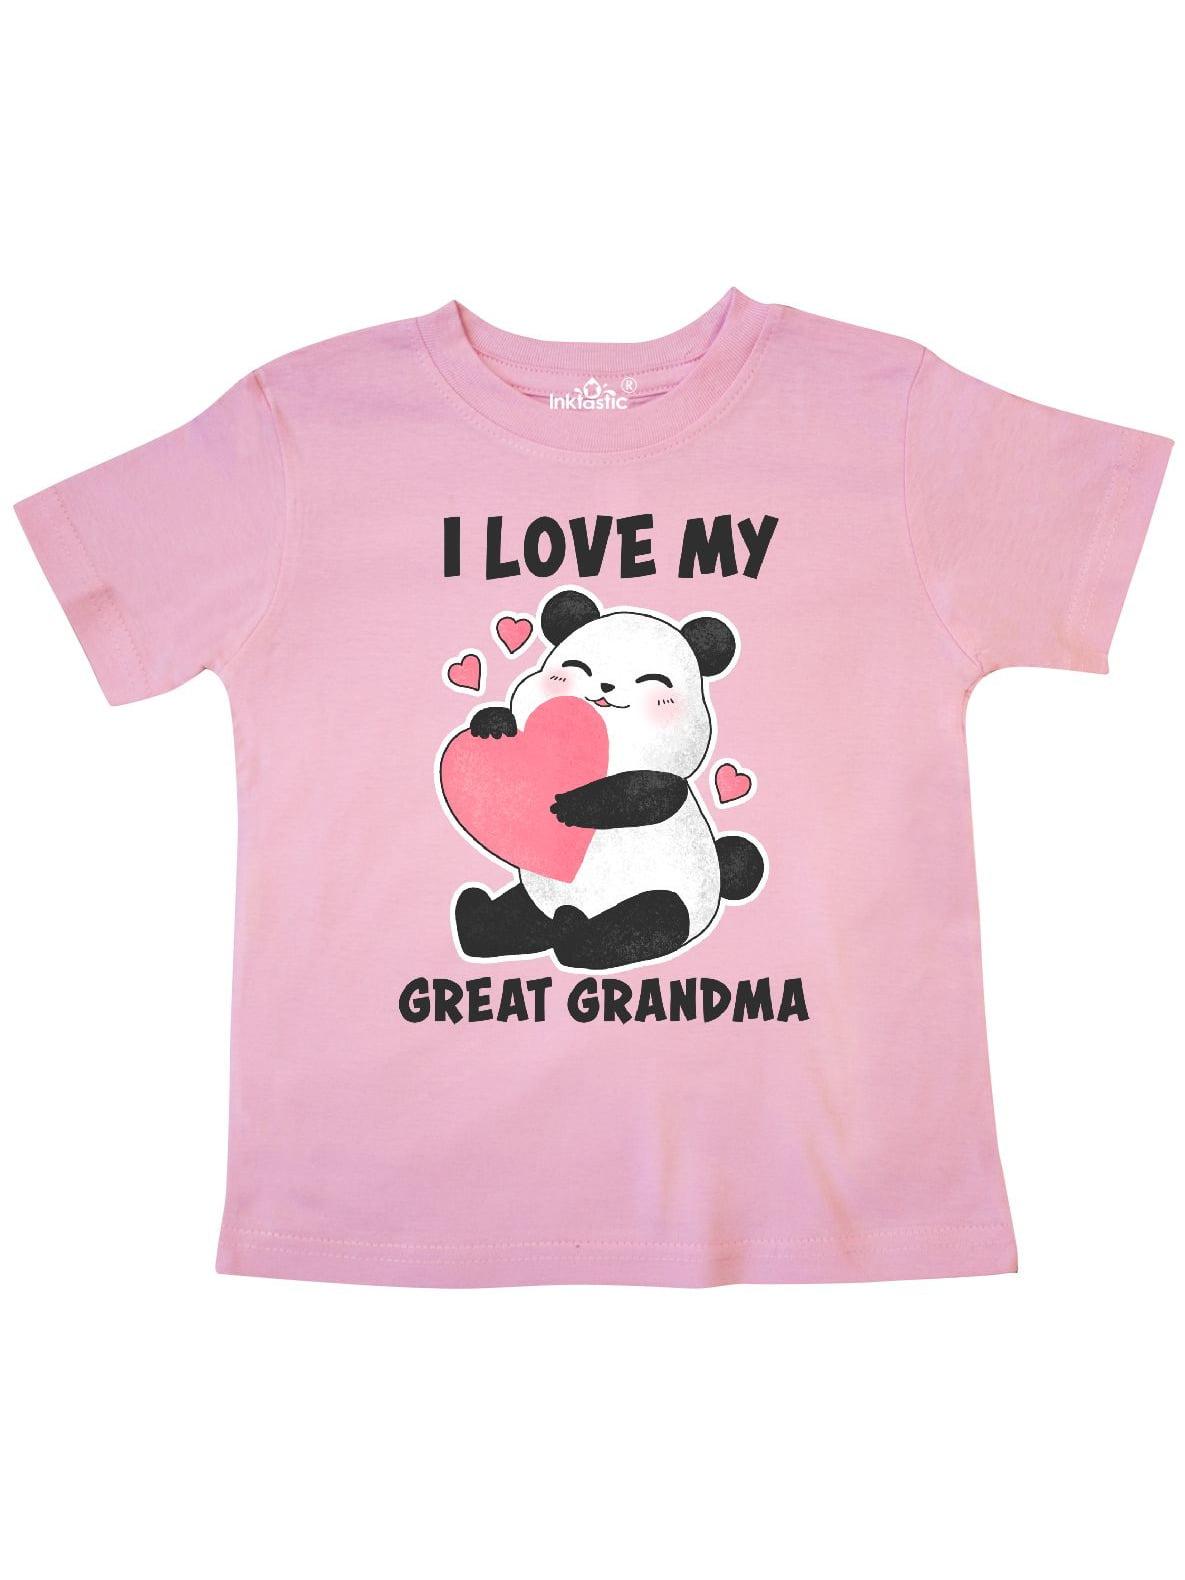 I Love My Great Grandma with Panda Illustration Toddler T-Shirt